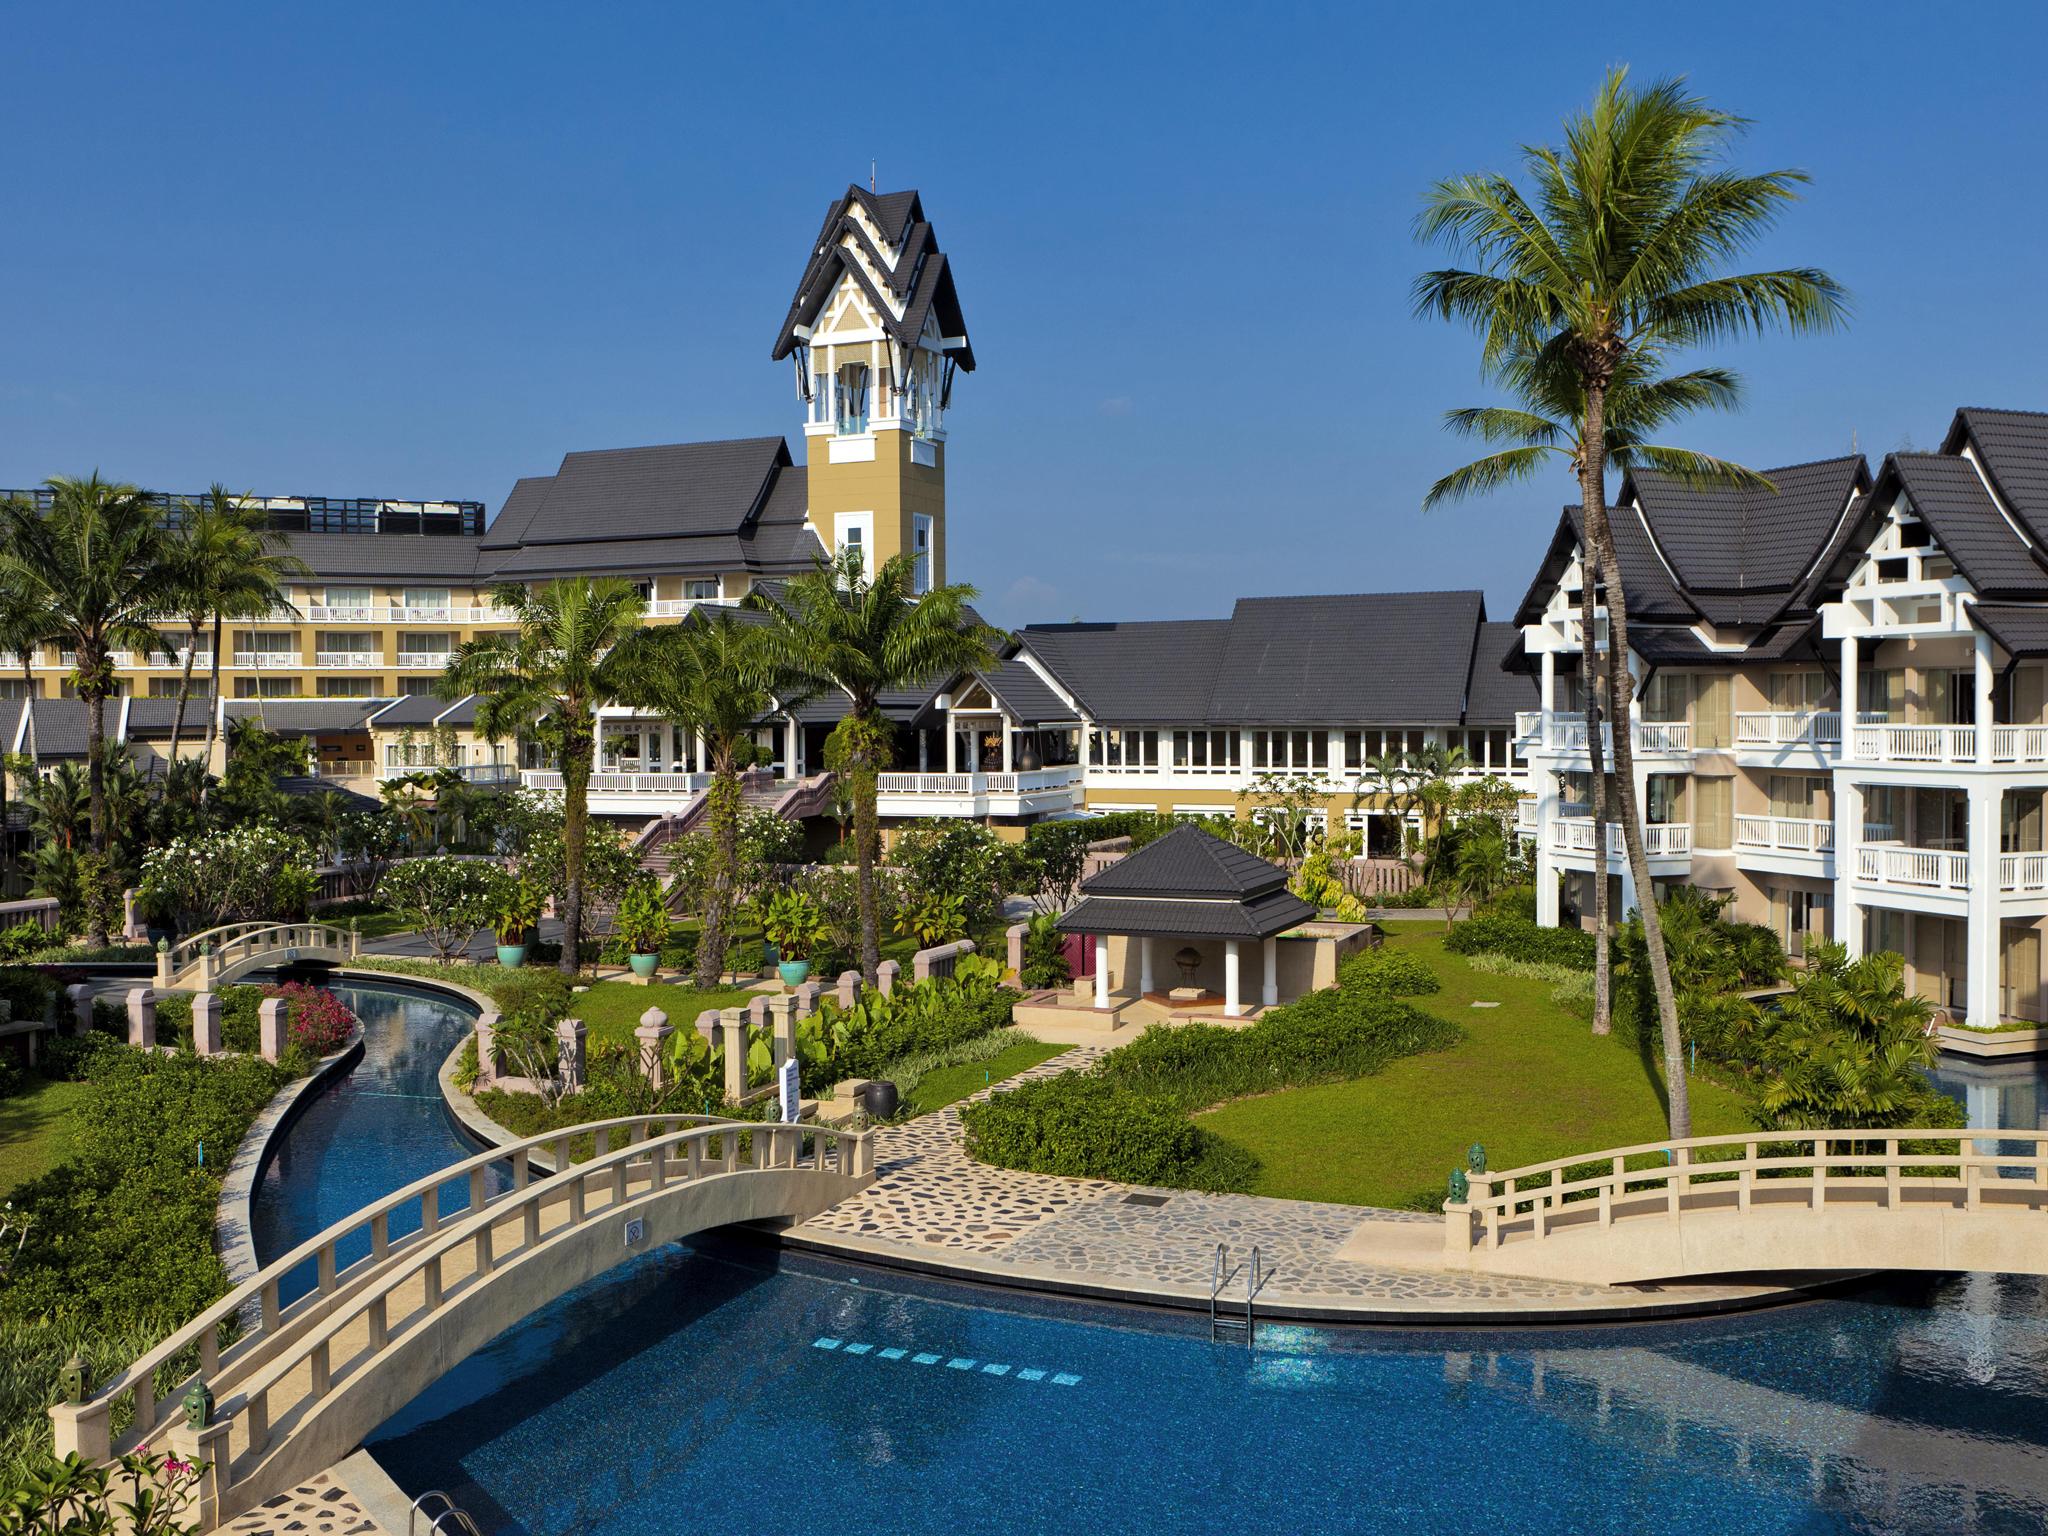 Hotel - Angsana Zhuhai Phoenix Bay (Eröffnung: Juni 2018)